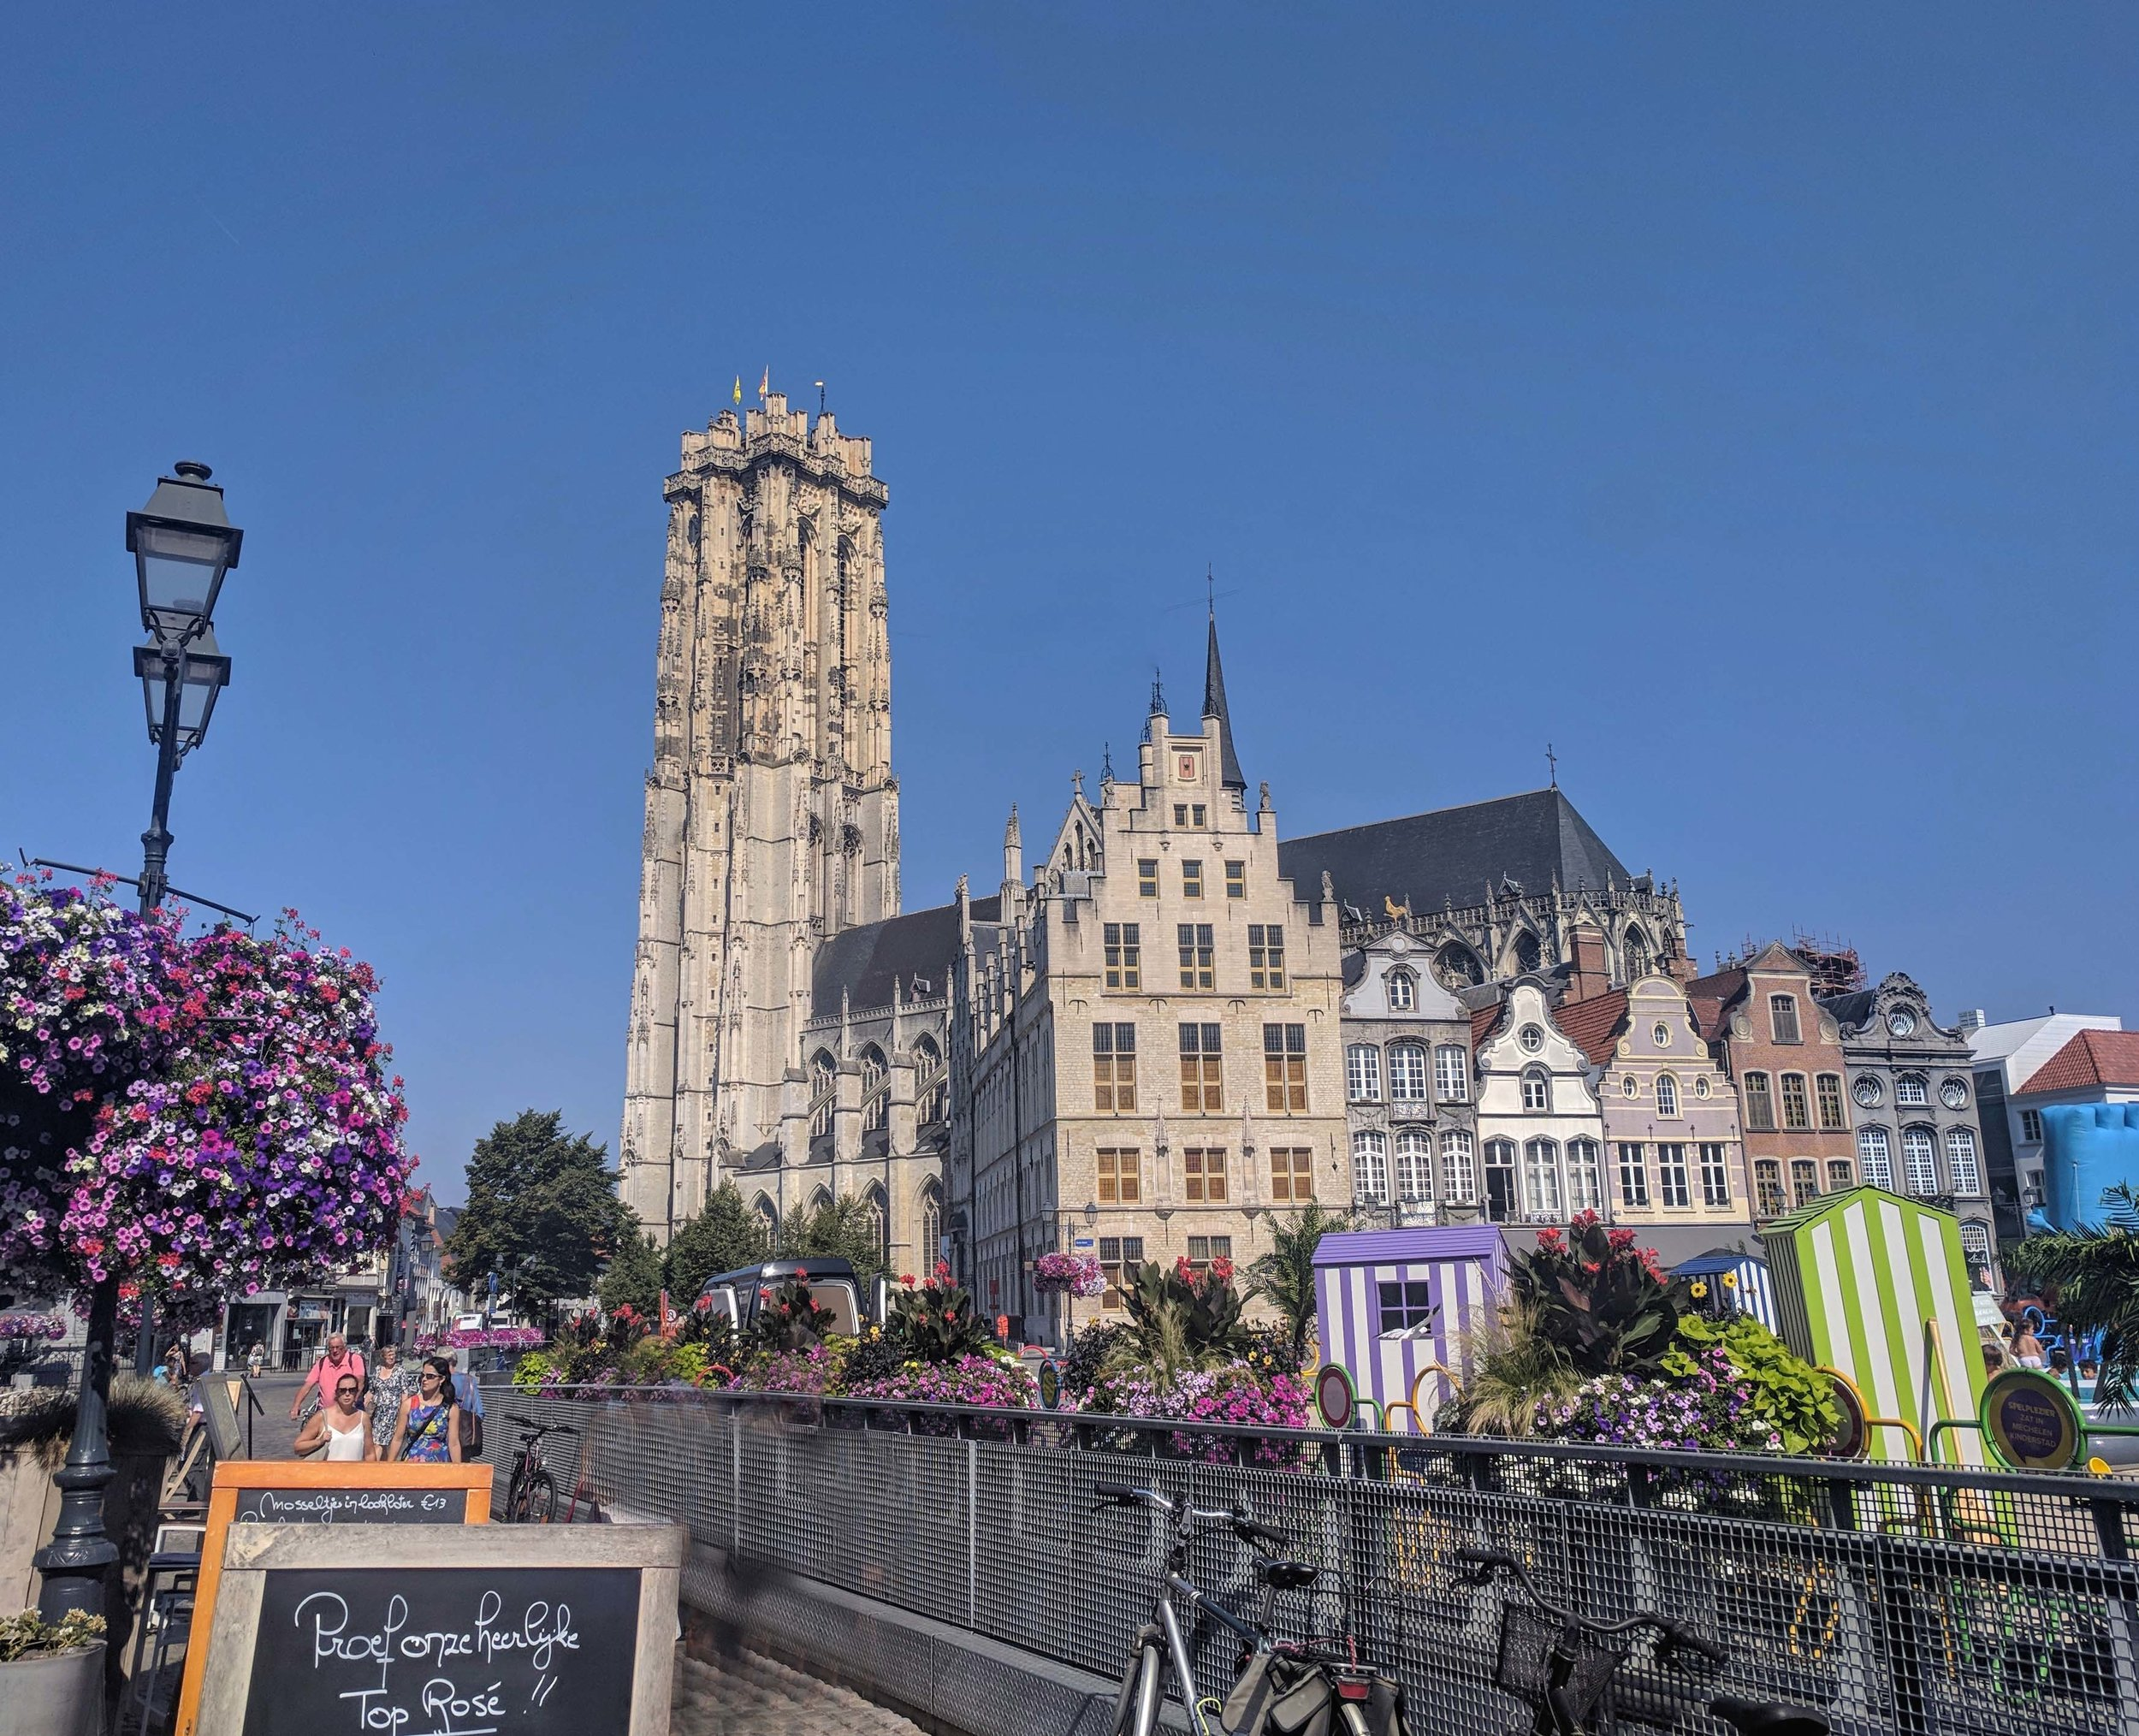 St Rumbold's Tower looming over Mechelen